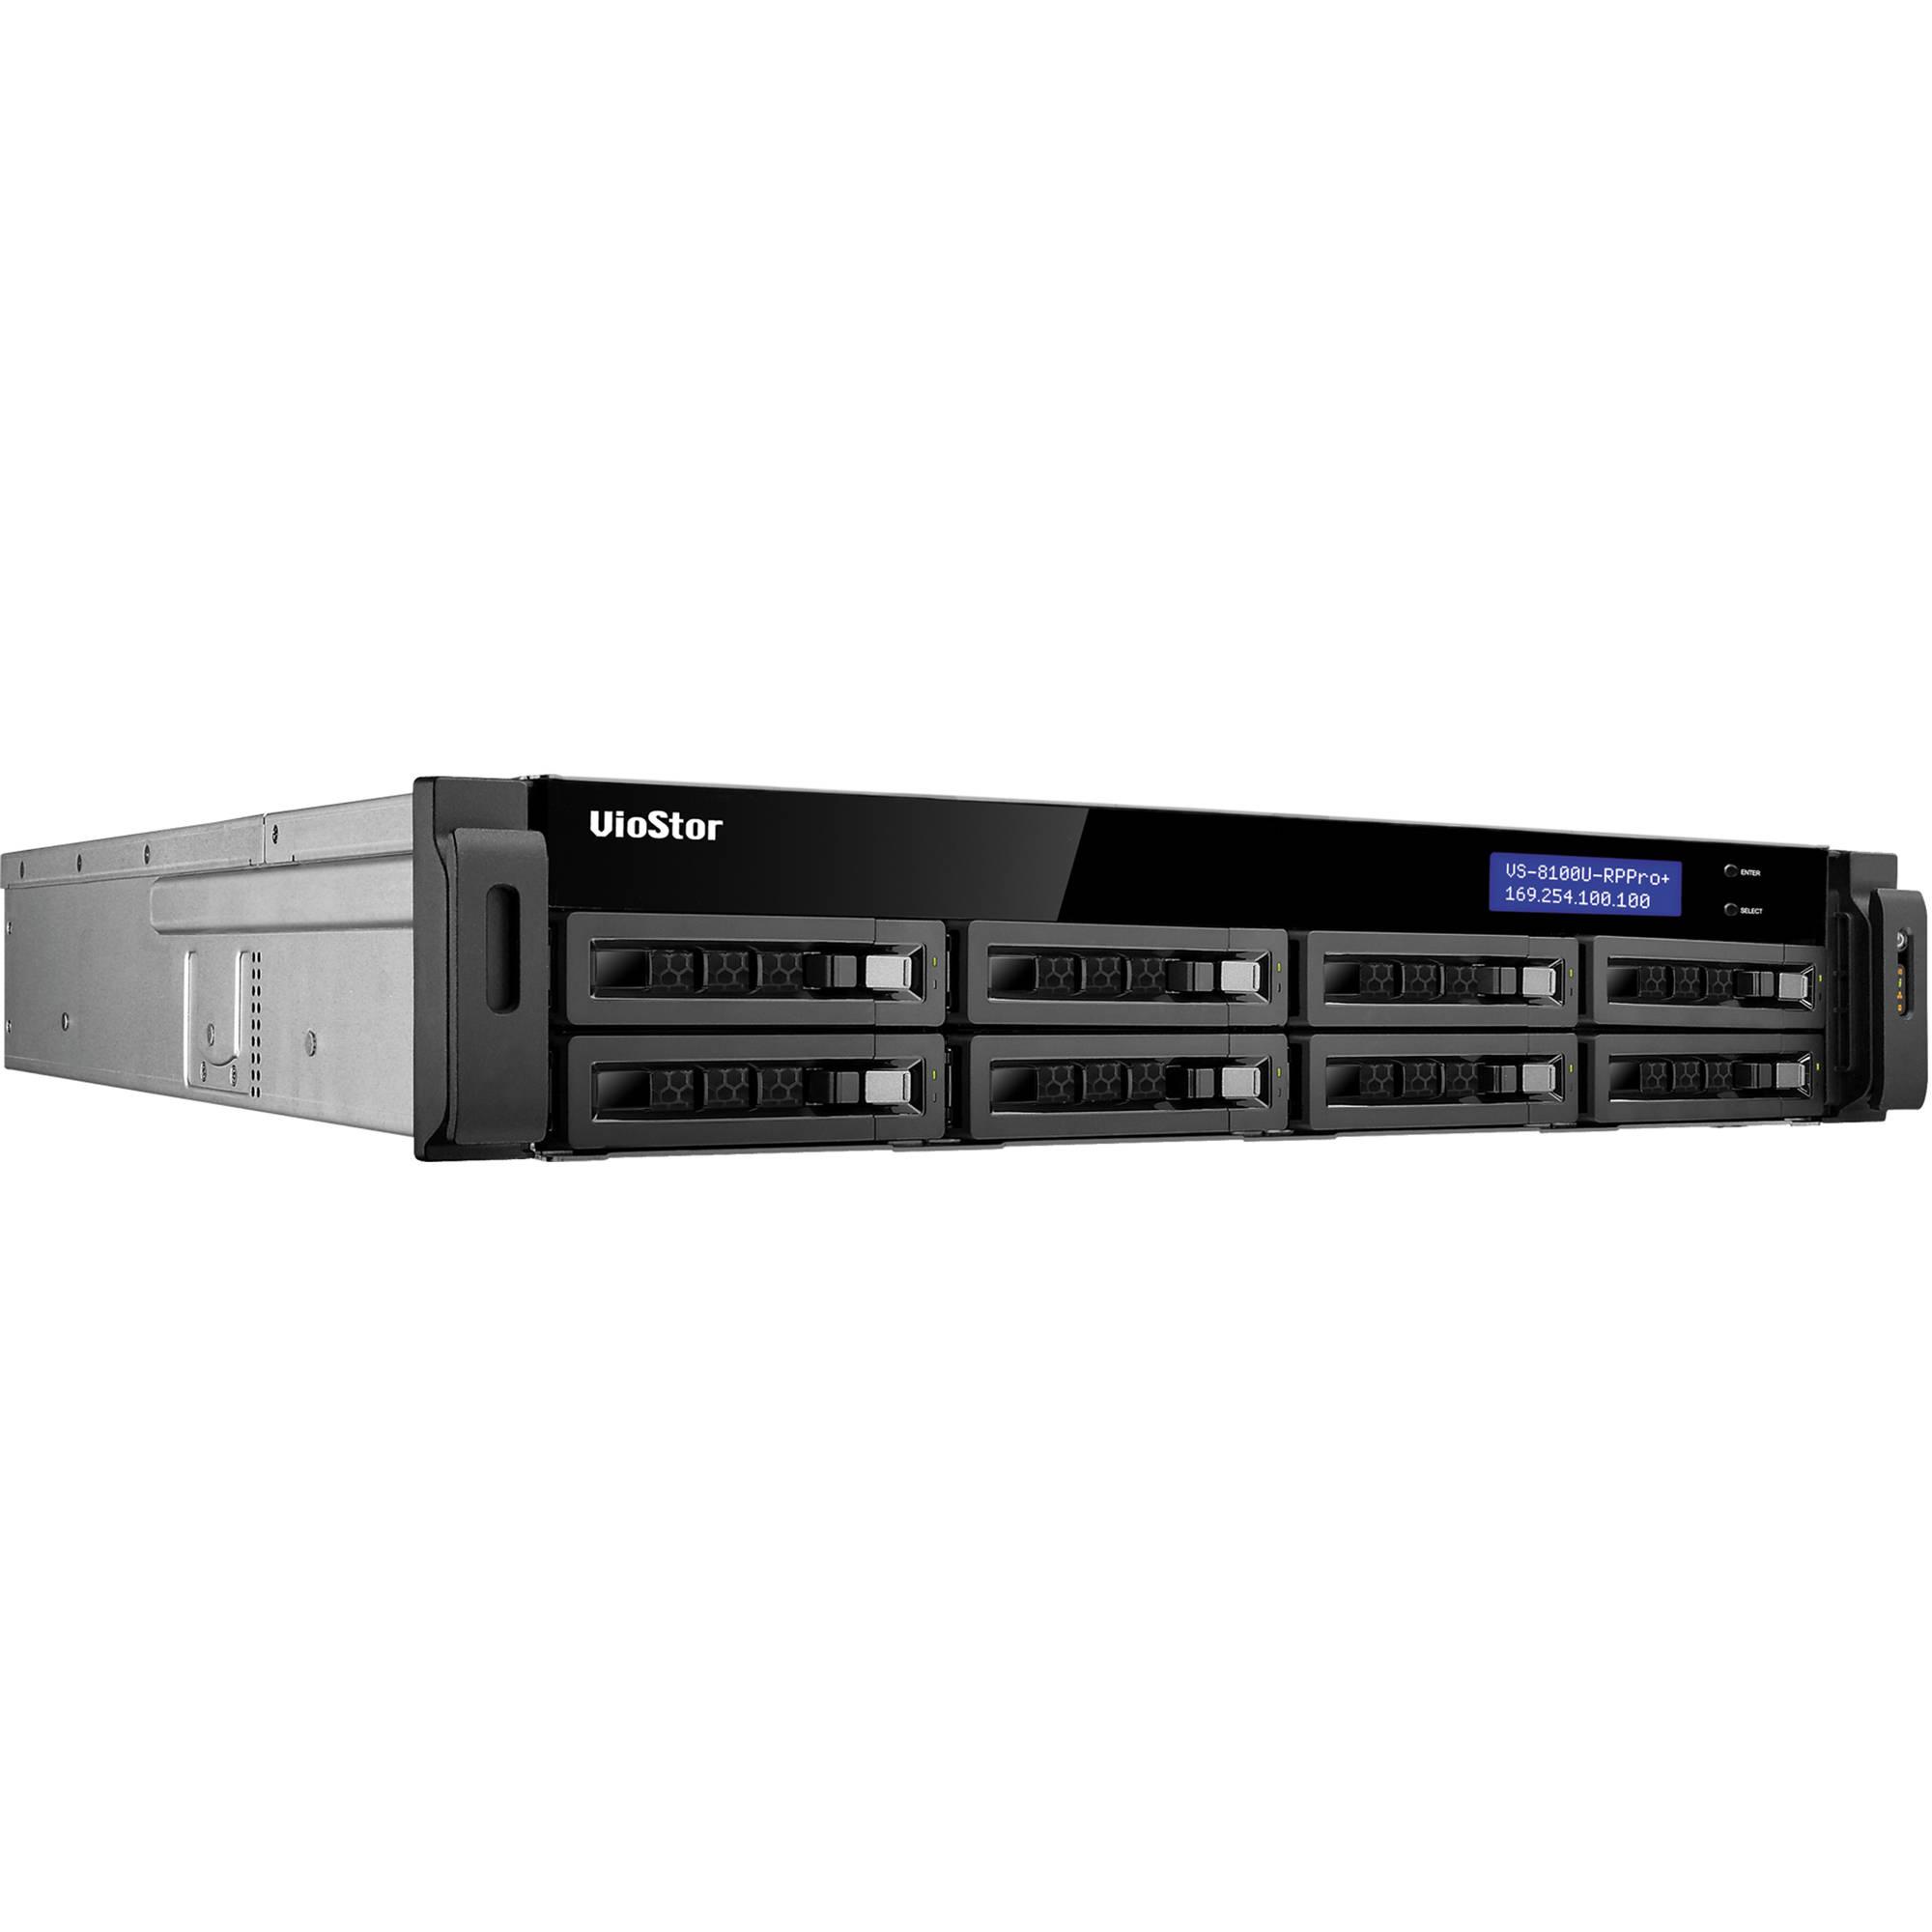 QNAP VS-8124U-RP Pro+ NVR Driver for Windows 7